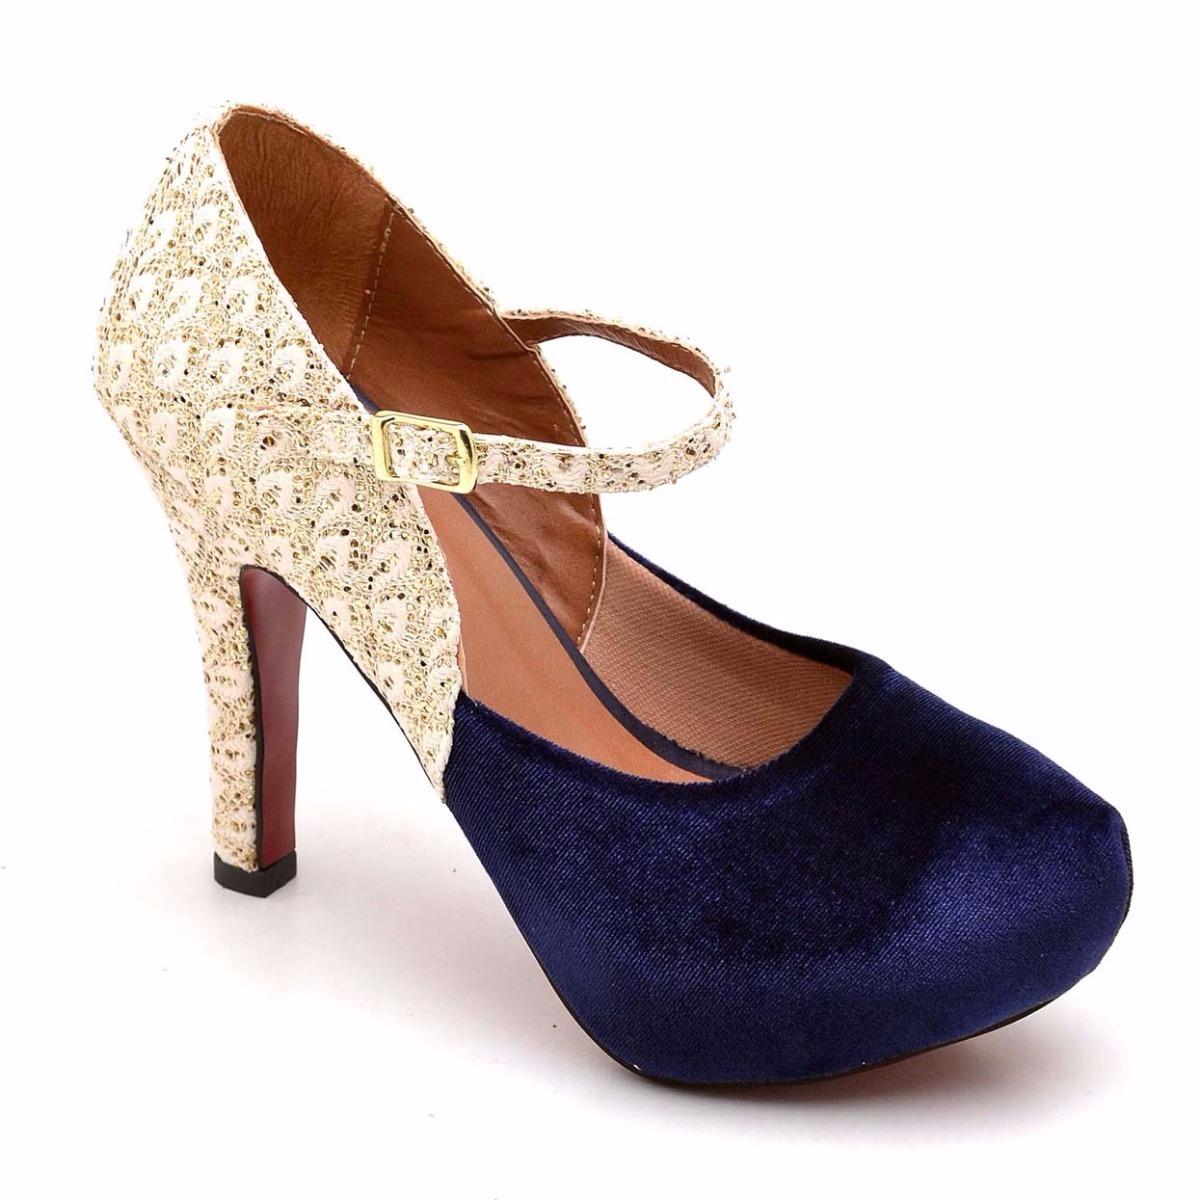 b8a1142b9f sapato bota sandalia scarpin meia pata salto alto luxo brilh. Carregando  zoom.